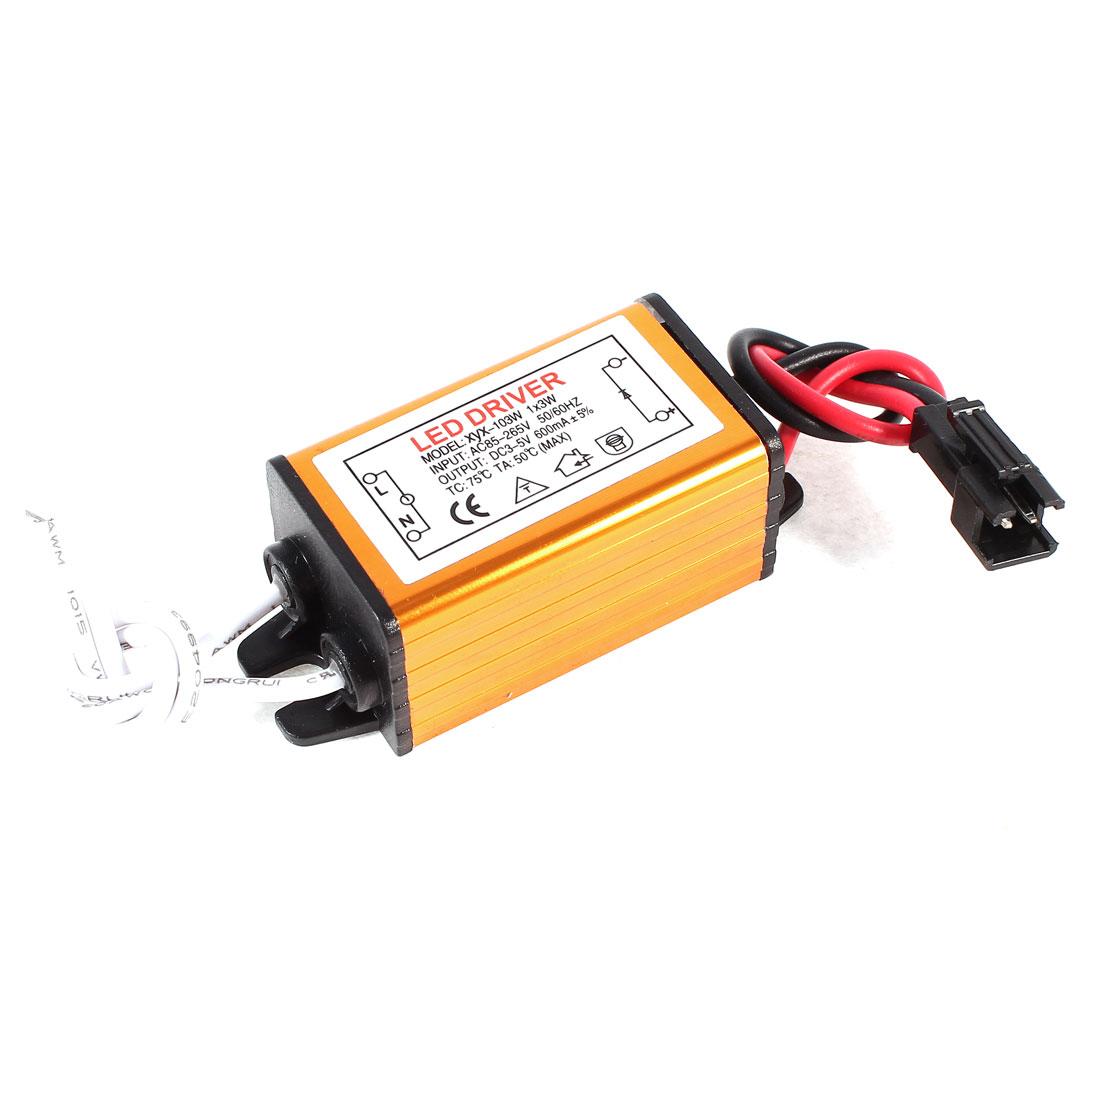 AC 85-265V DC 3-5V 600mA LED Driver Power Supply Converter Adapter for 1x3W LED Strip Light